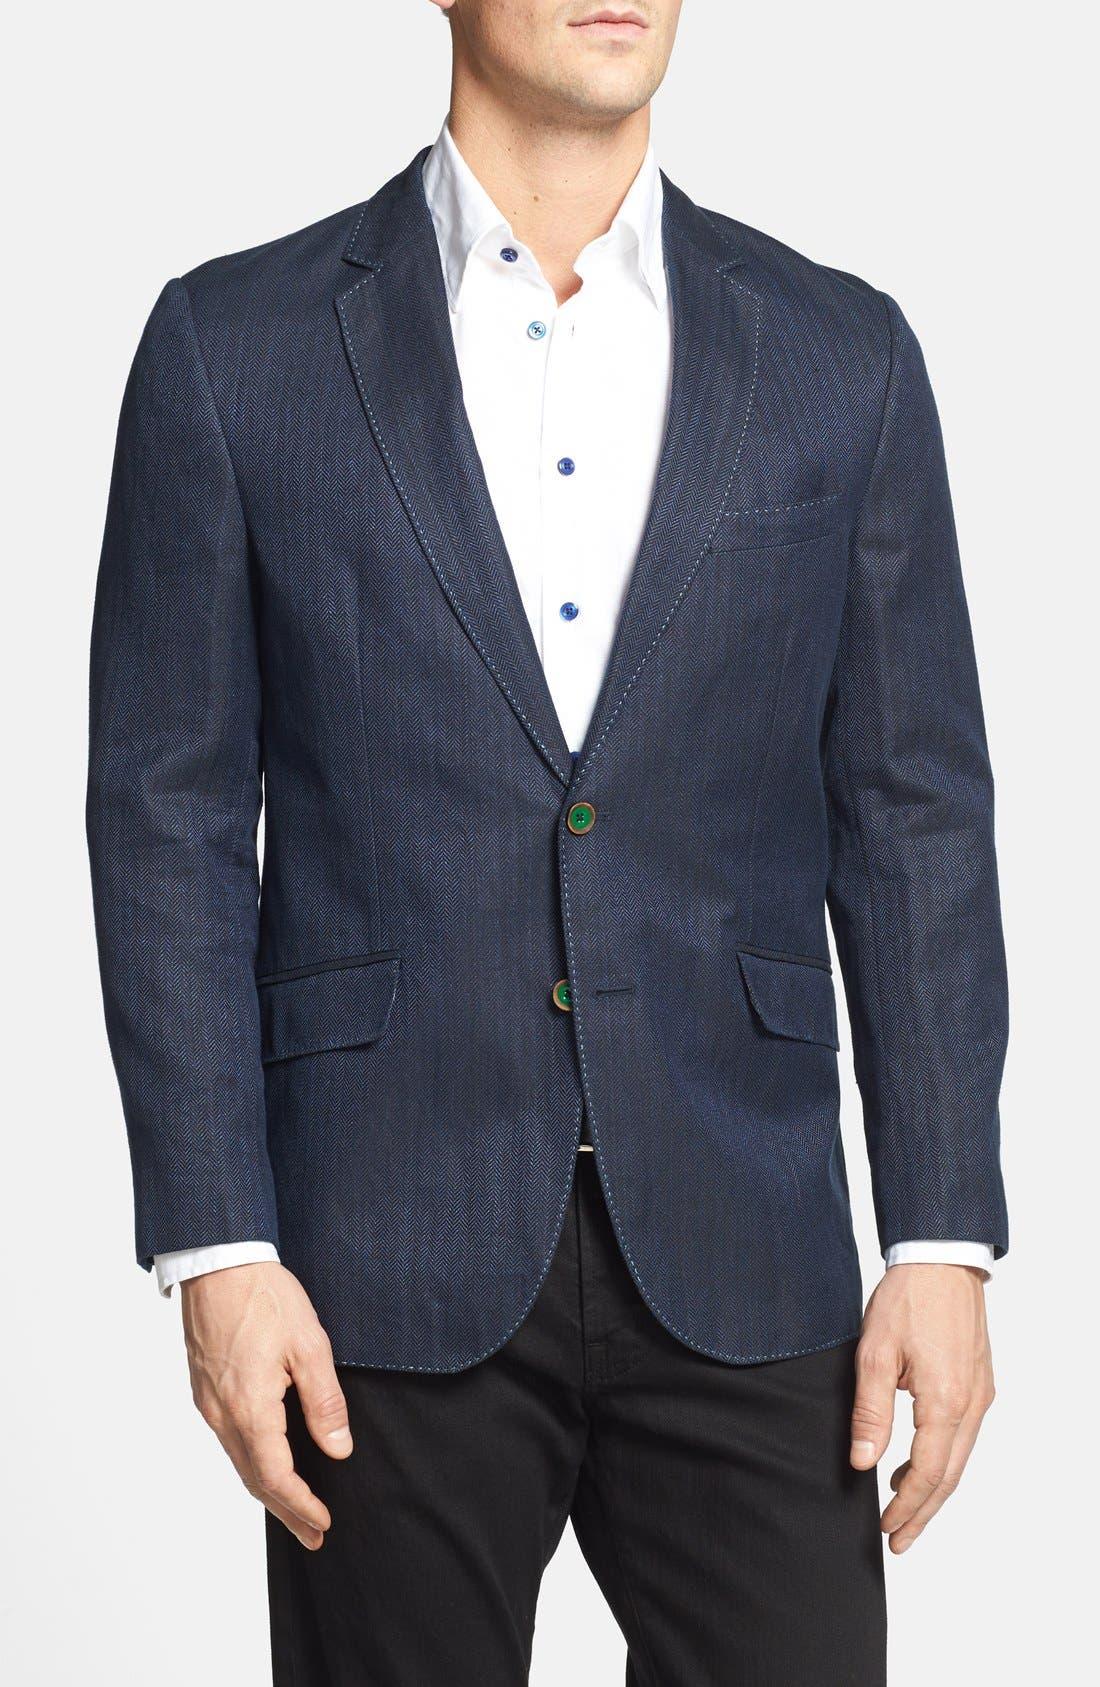 Main Image - Robert Graham 'Campbell' Linen Blend Sportcoat